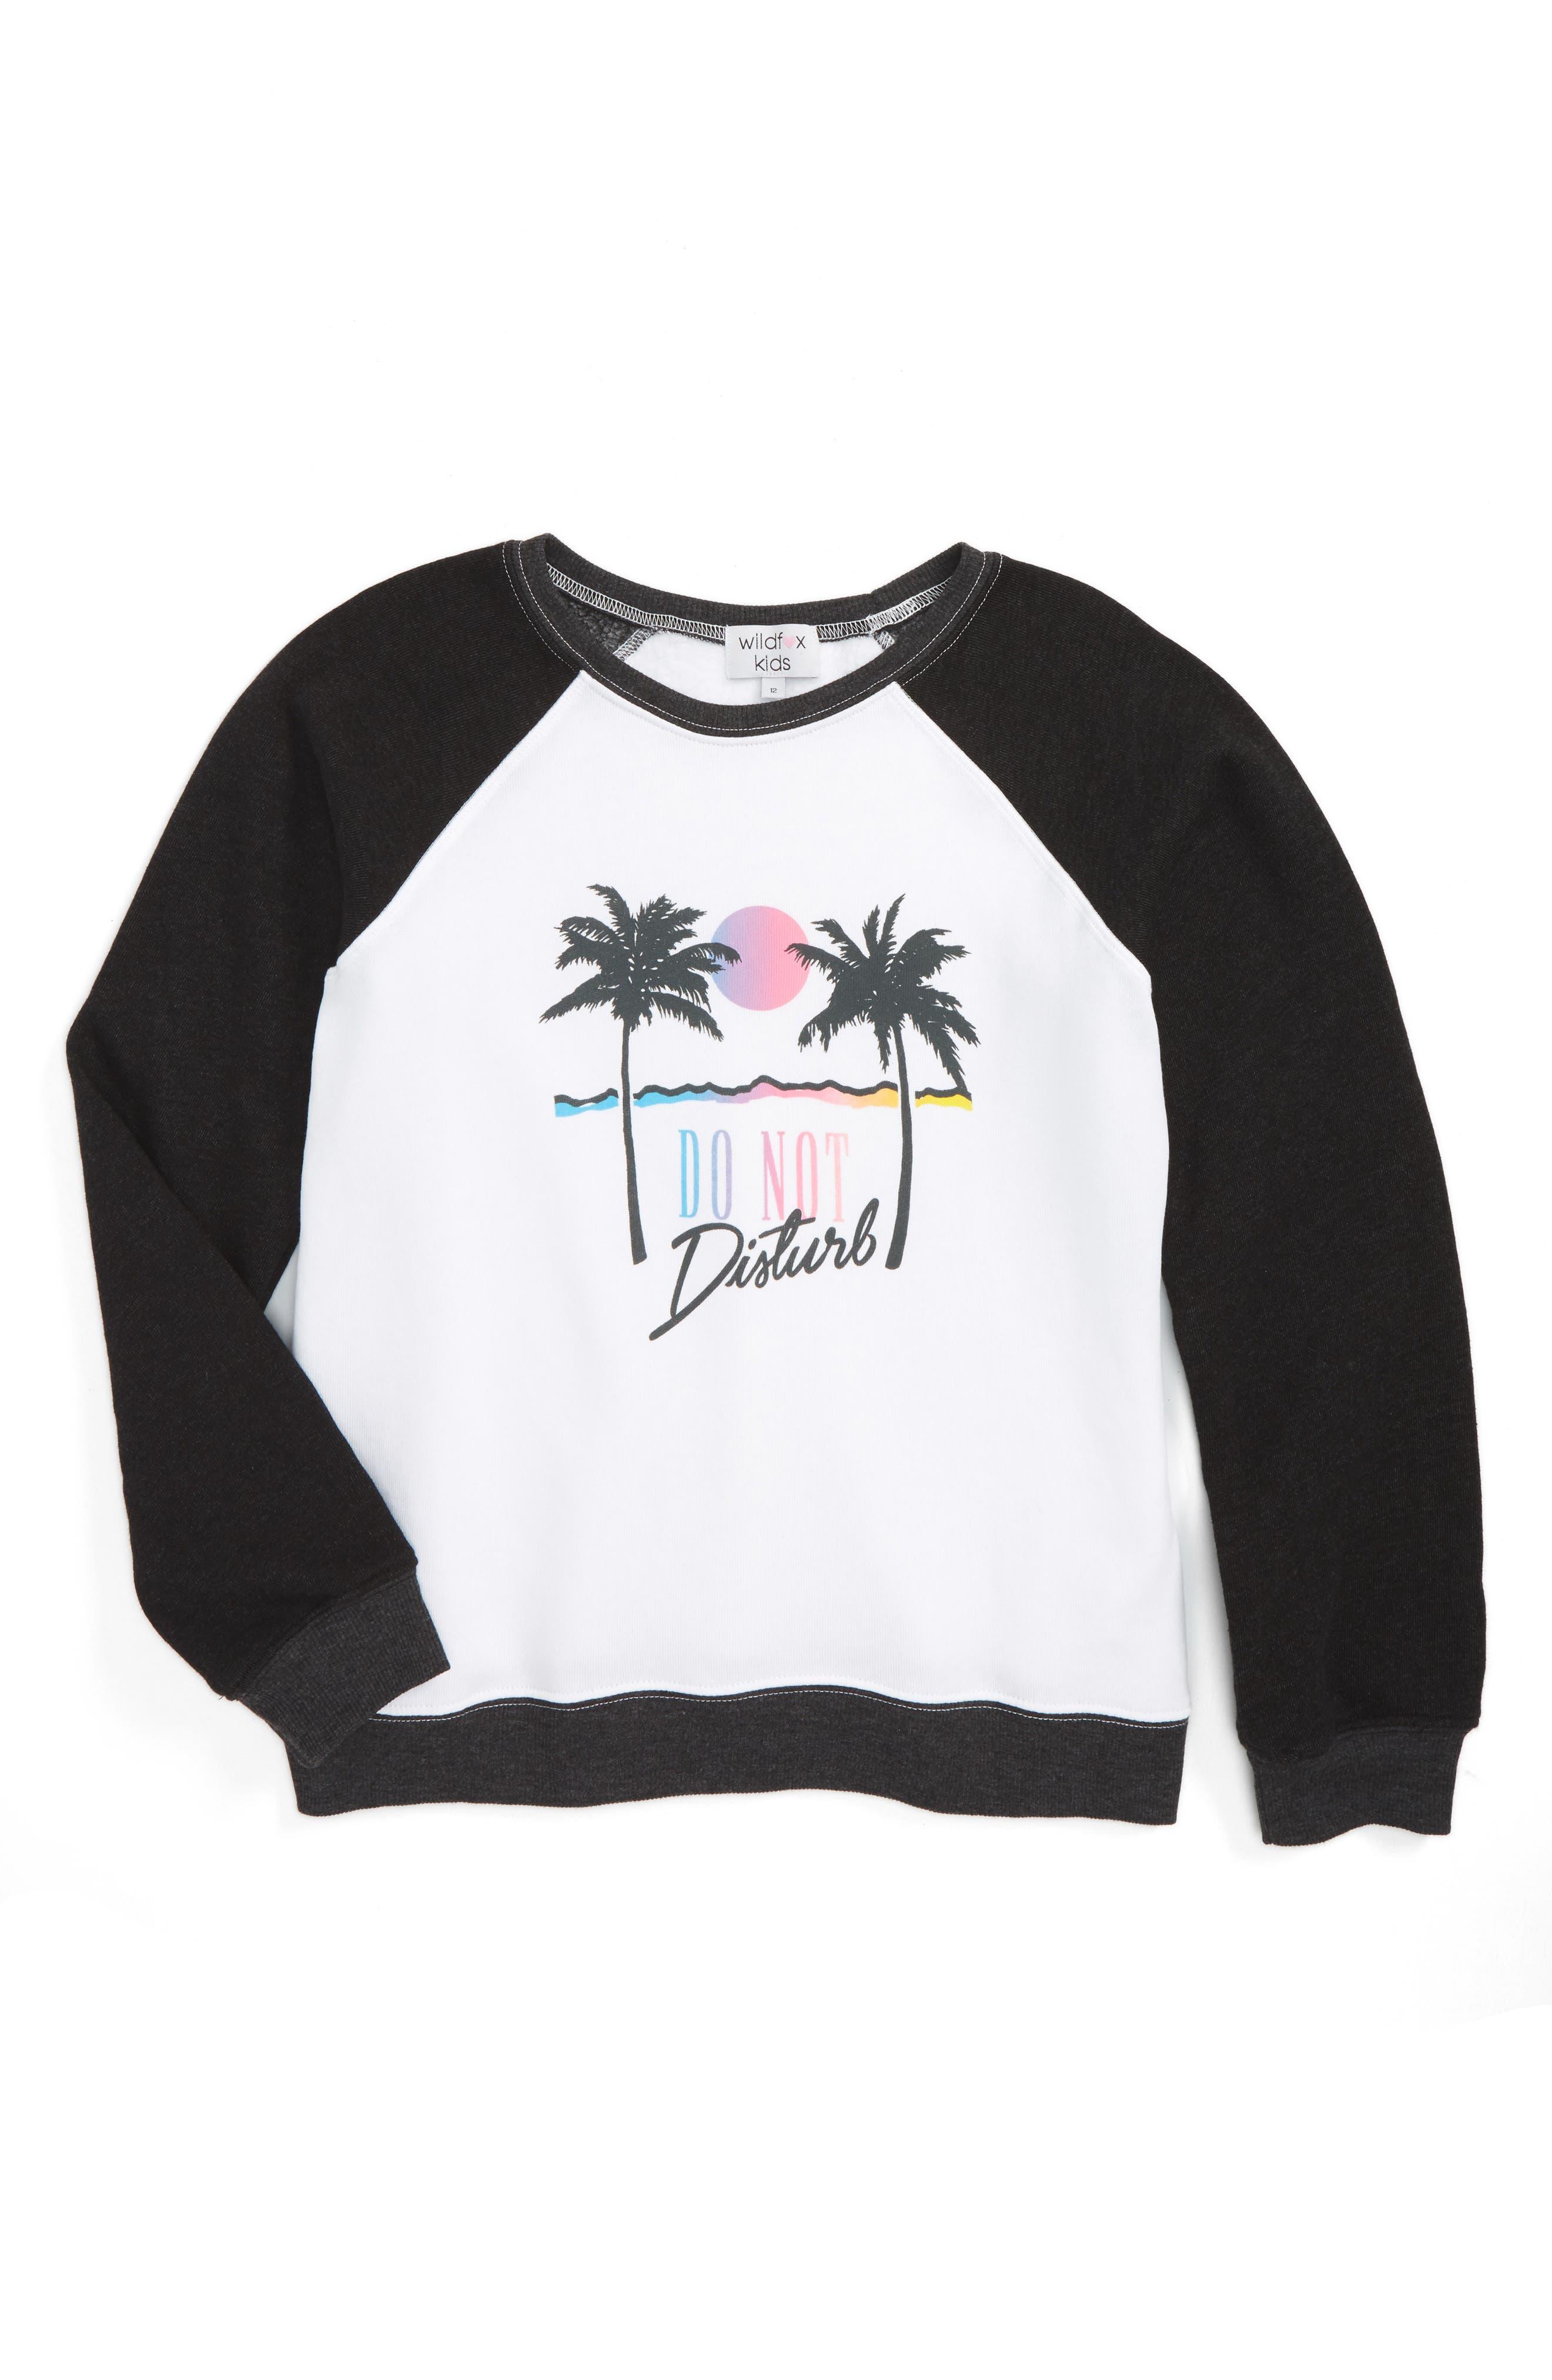 Main Image - Wildfox Do Not Disturb Graphic Sweatshirt (Big Girls)